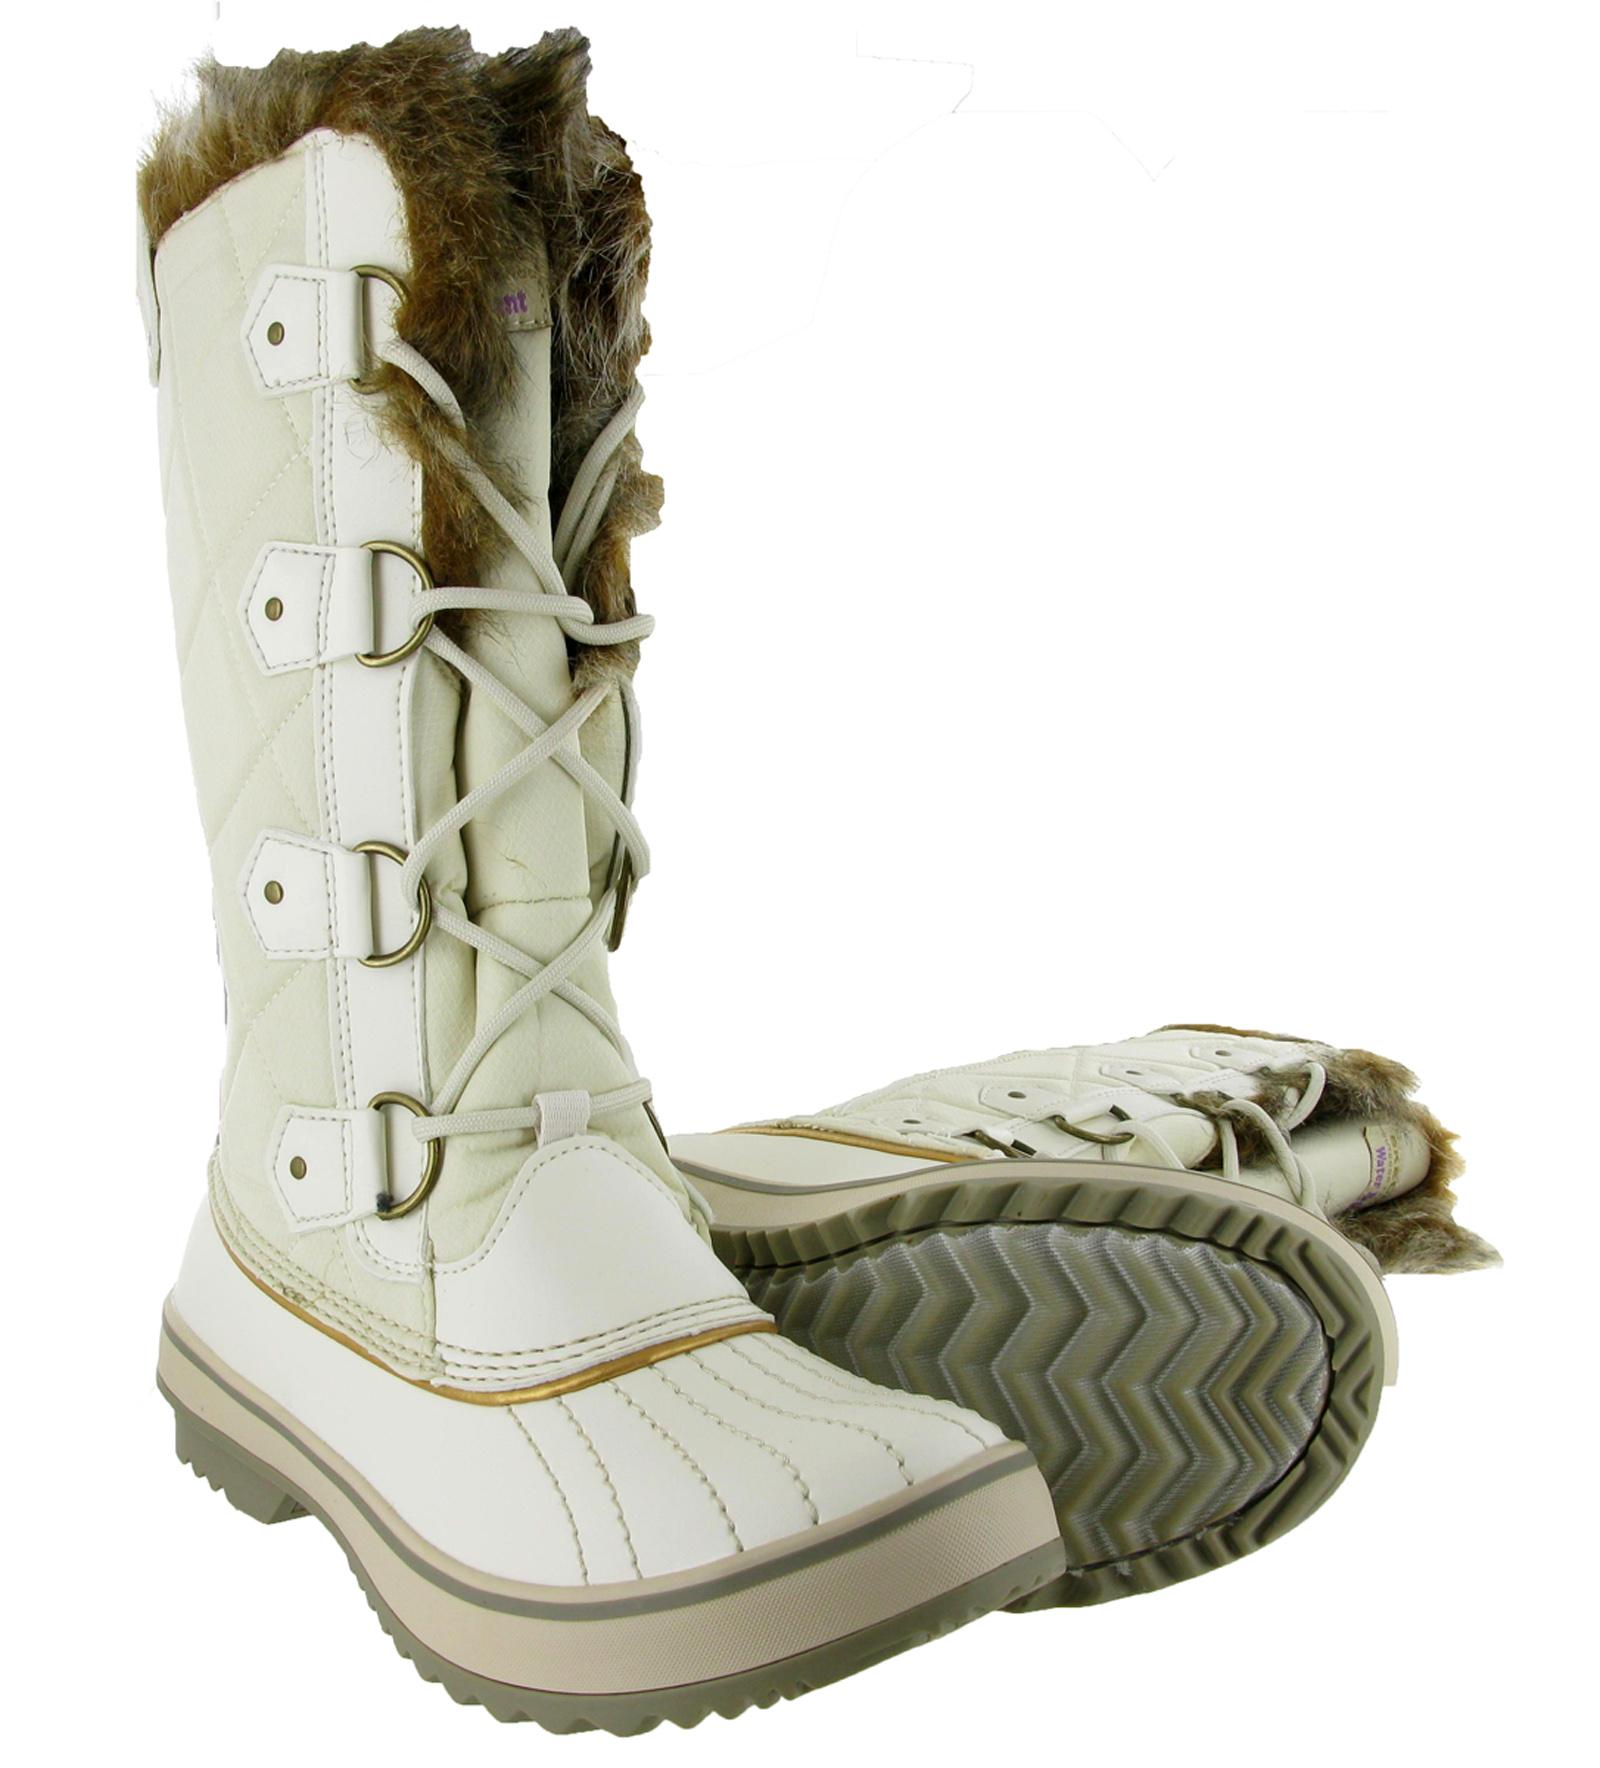 Skechers Premium Fur Womens Shoes